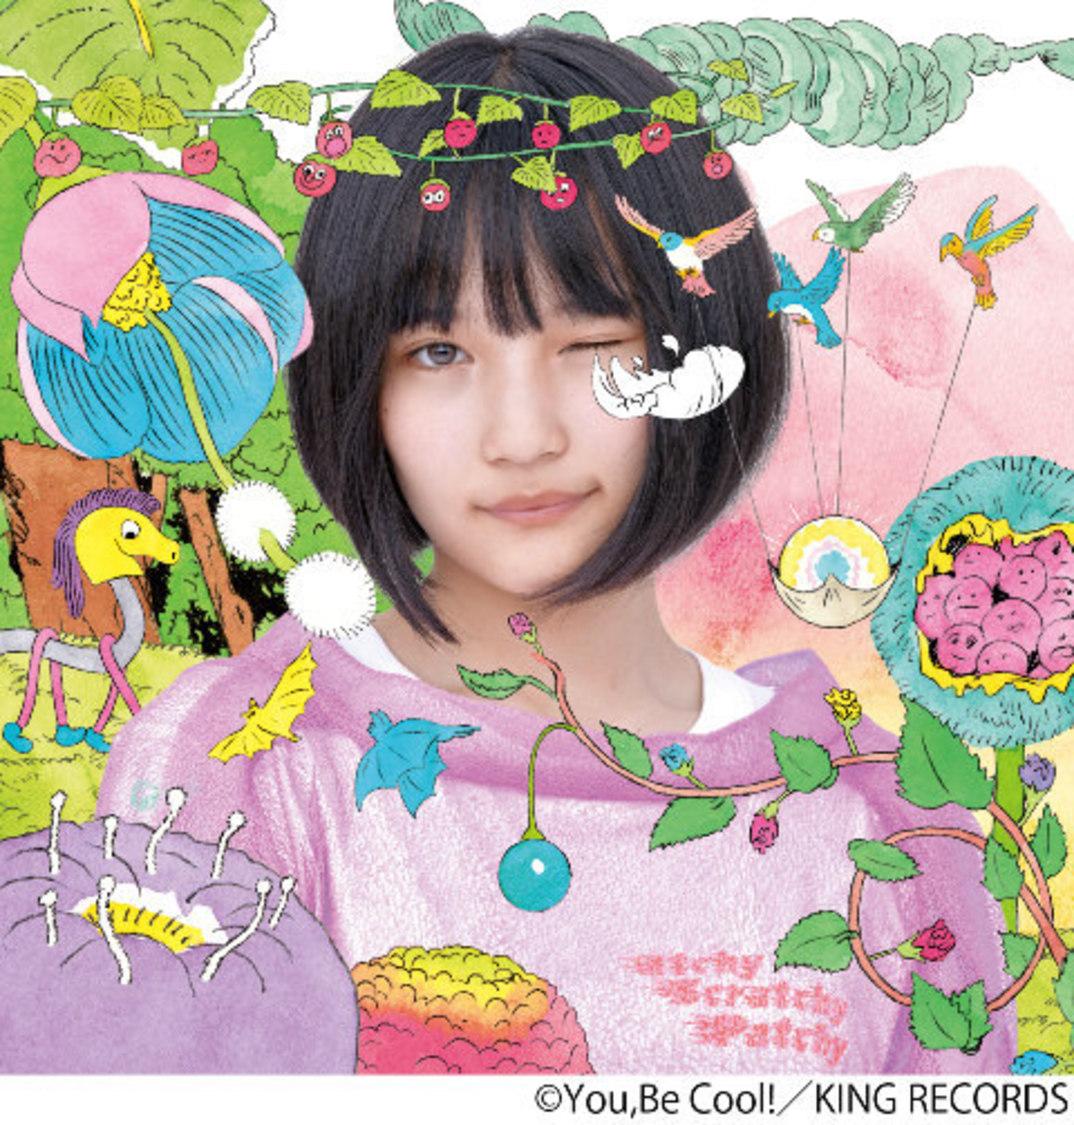 AKB48「サステナブル」、乃木坂46「夜明けまで強がらなくてもいい」がレコ協ミリオン認定に